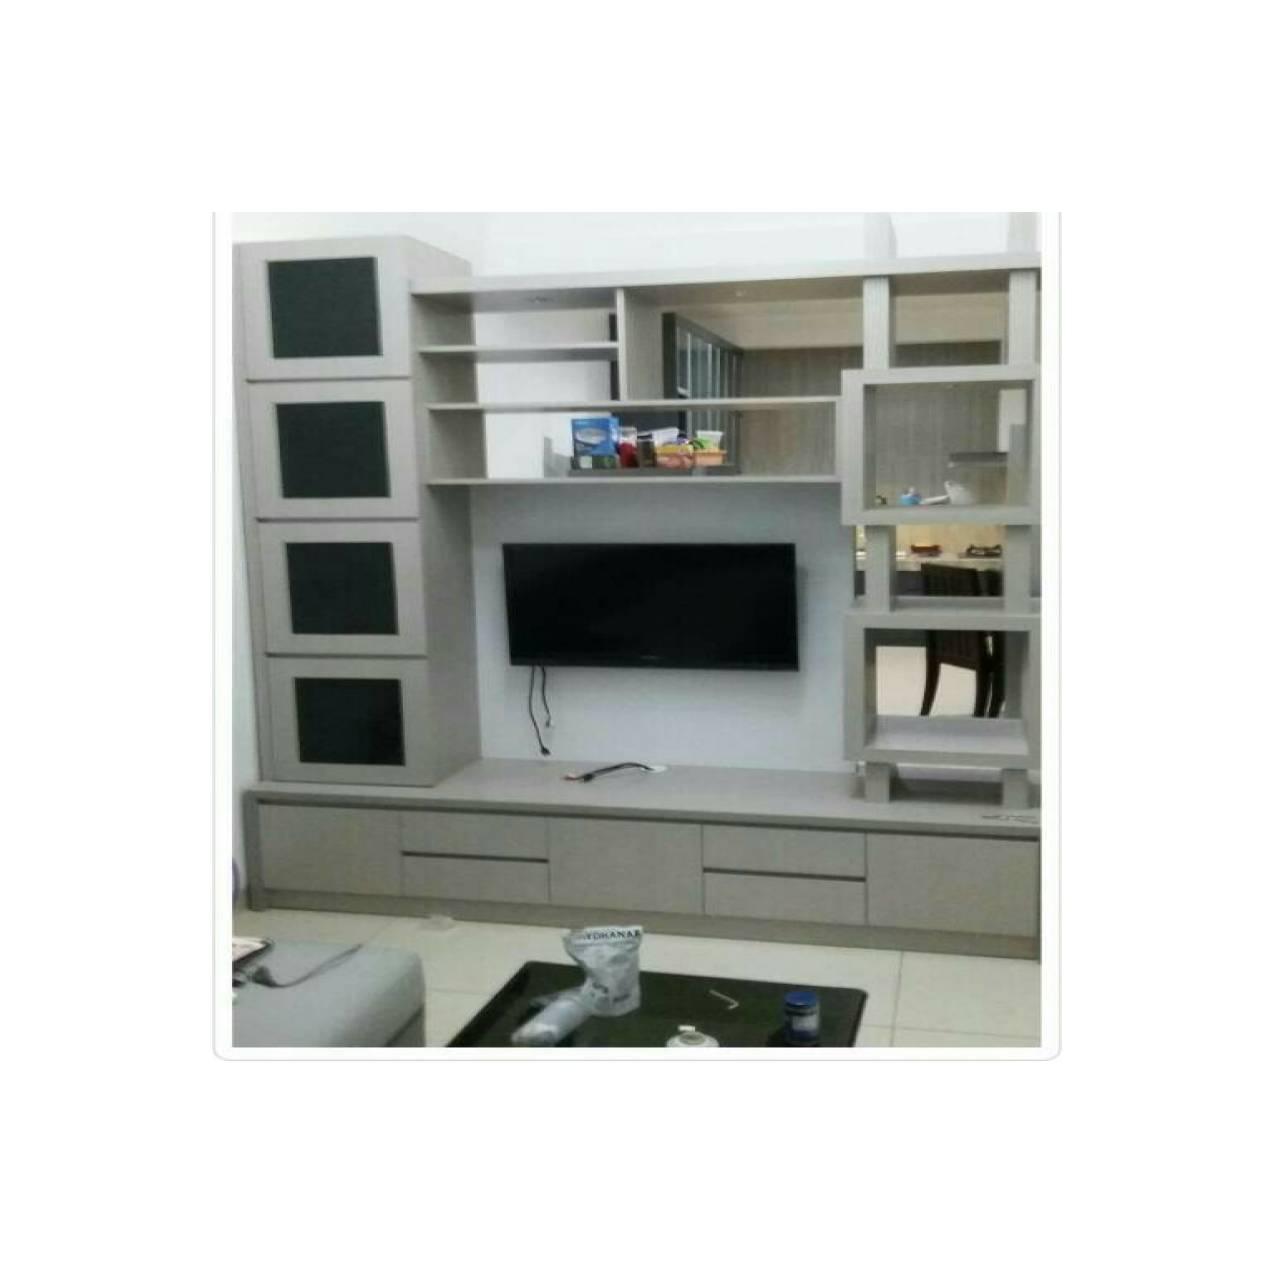 Furniture Custome Rak Tv, lemari TV, Backdrop TV custome 1,